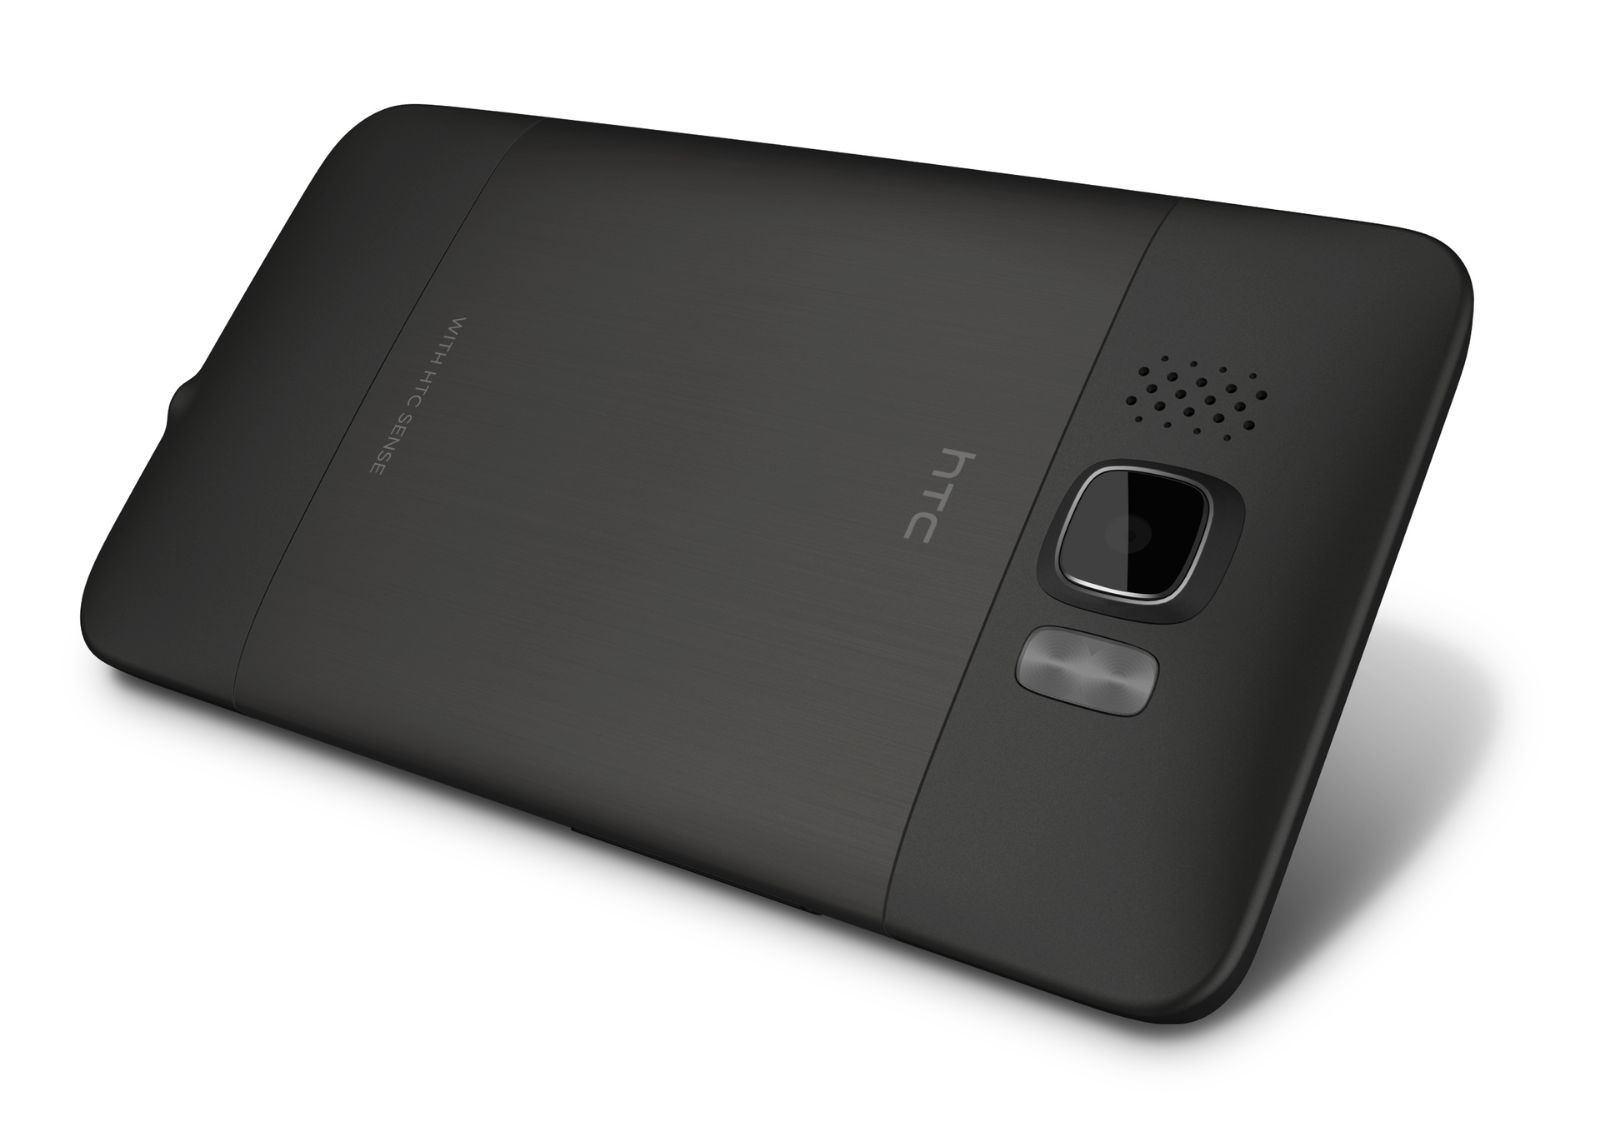 HTC HD2 Leo - Black (Unlocked) GSM 3G WiFi Windows Mobile Touch Smartphone 7